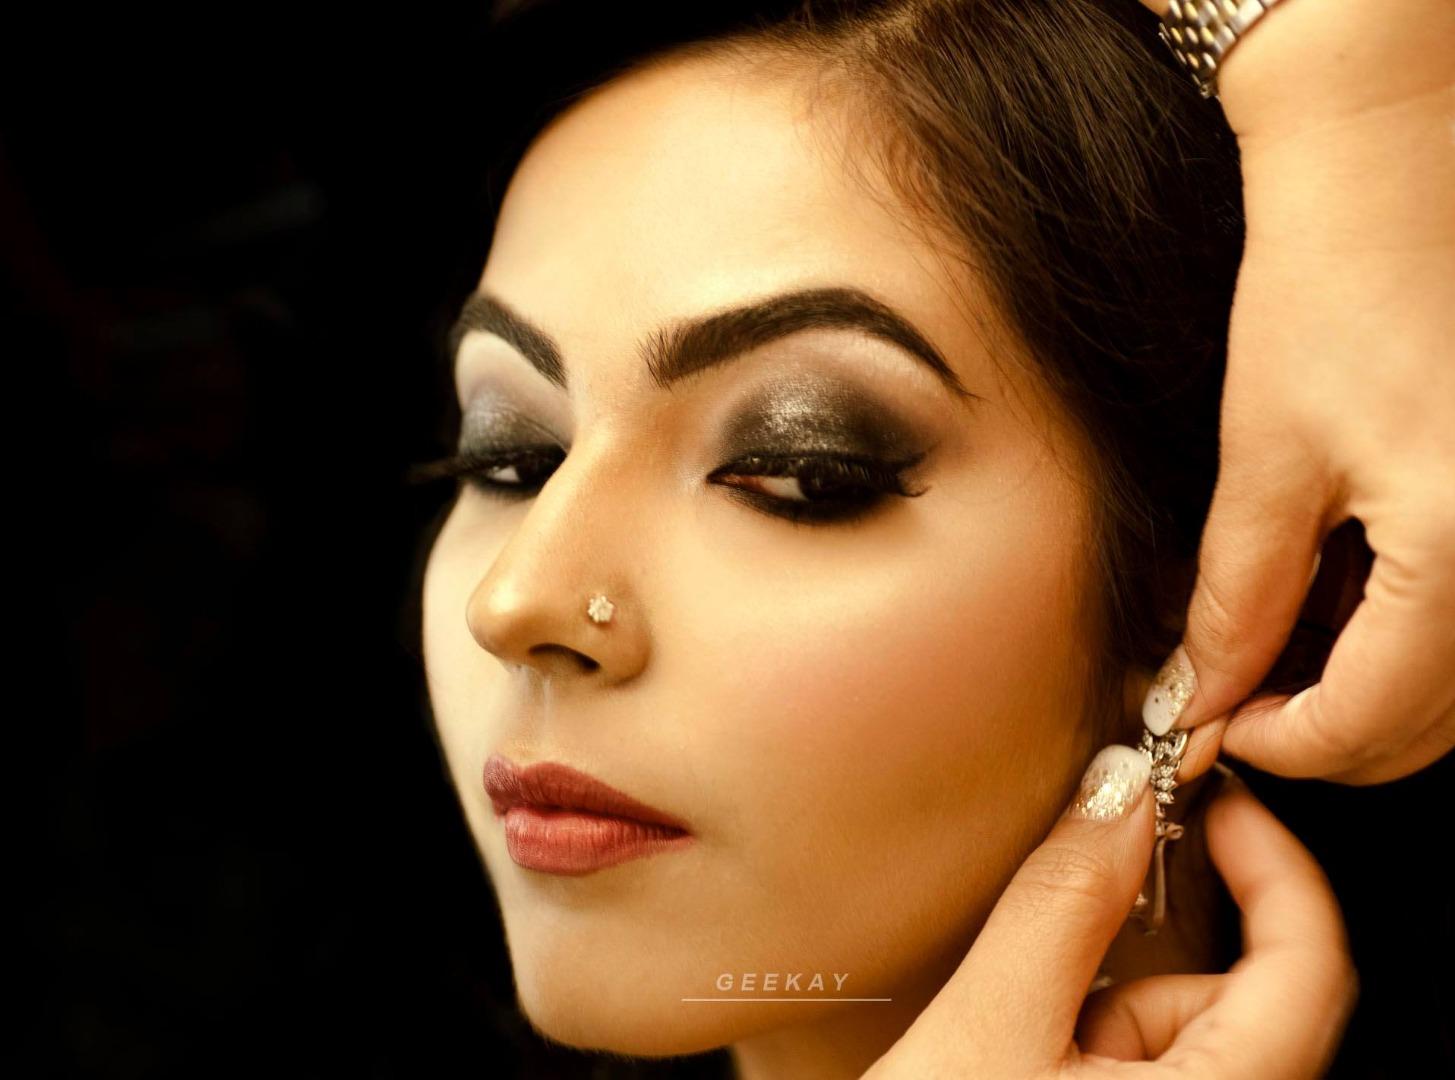 Beautiful natural makeup with smokey eyes